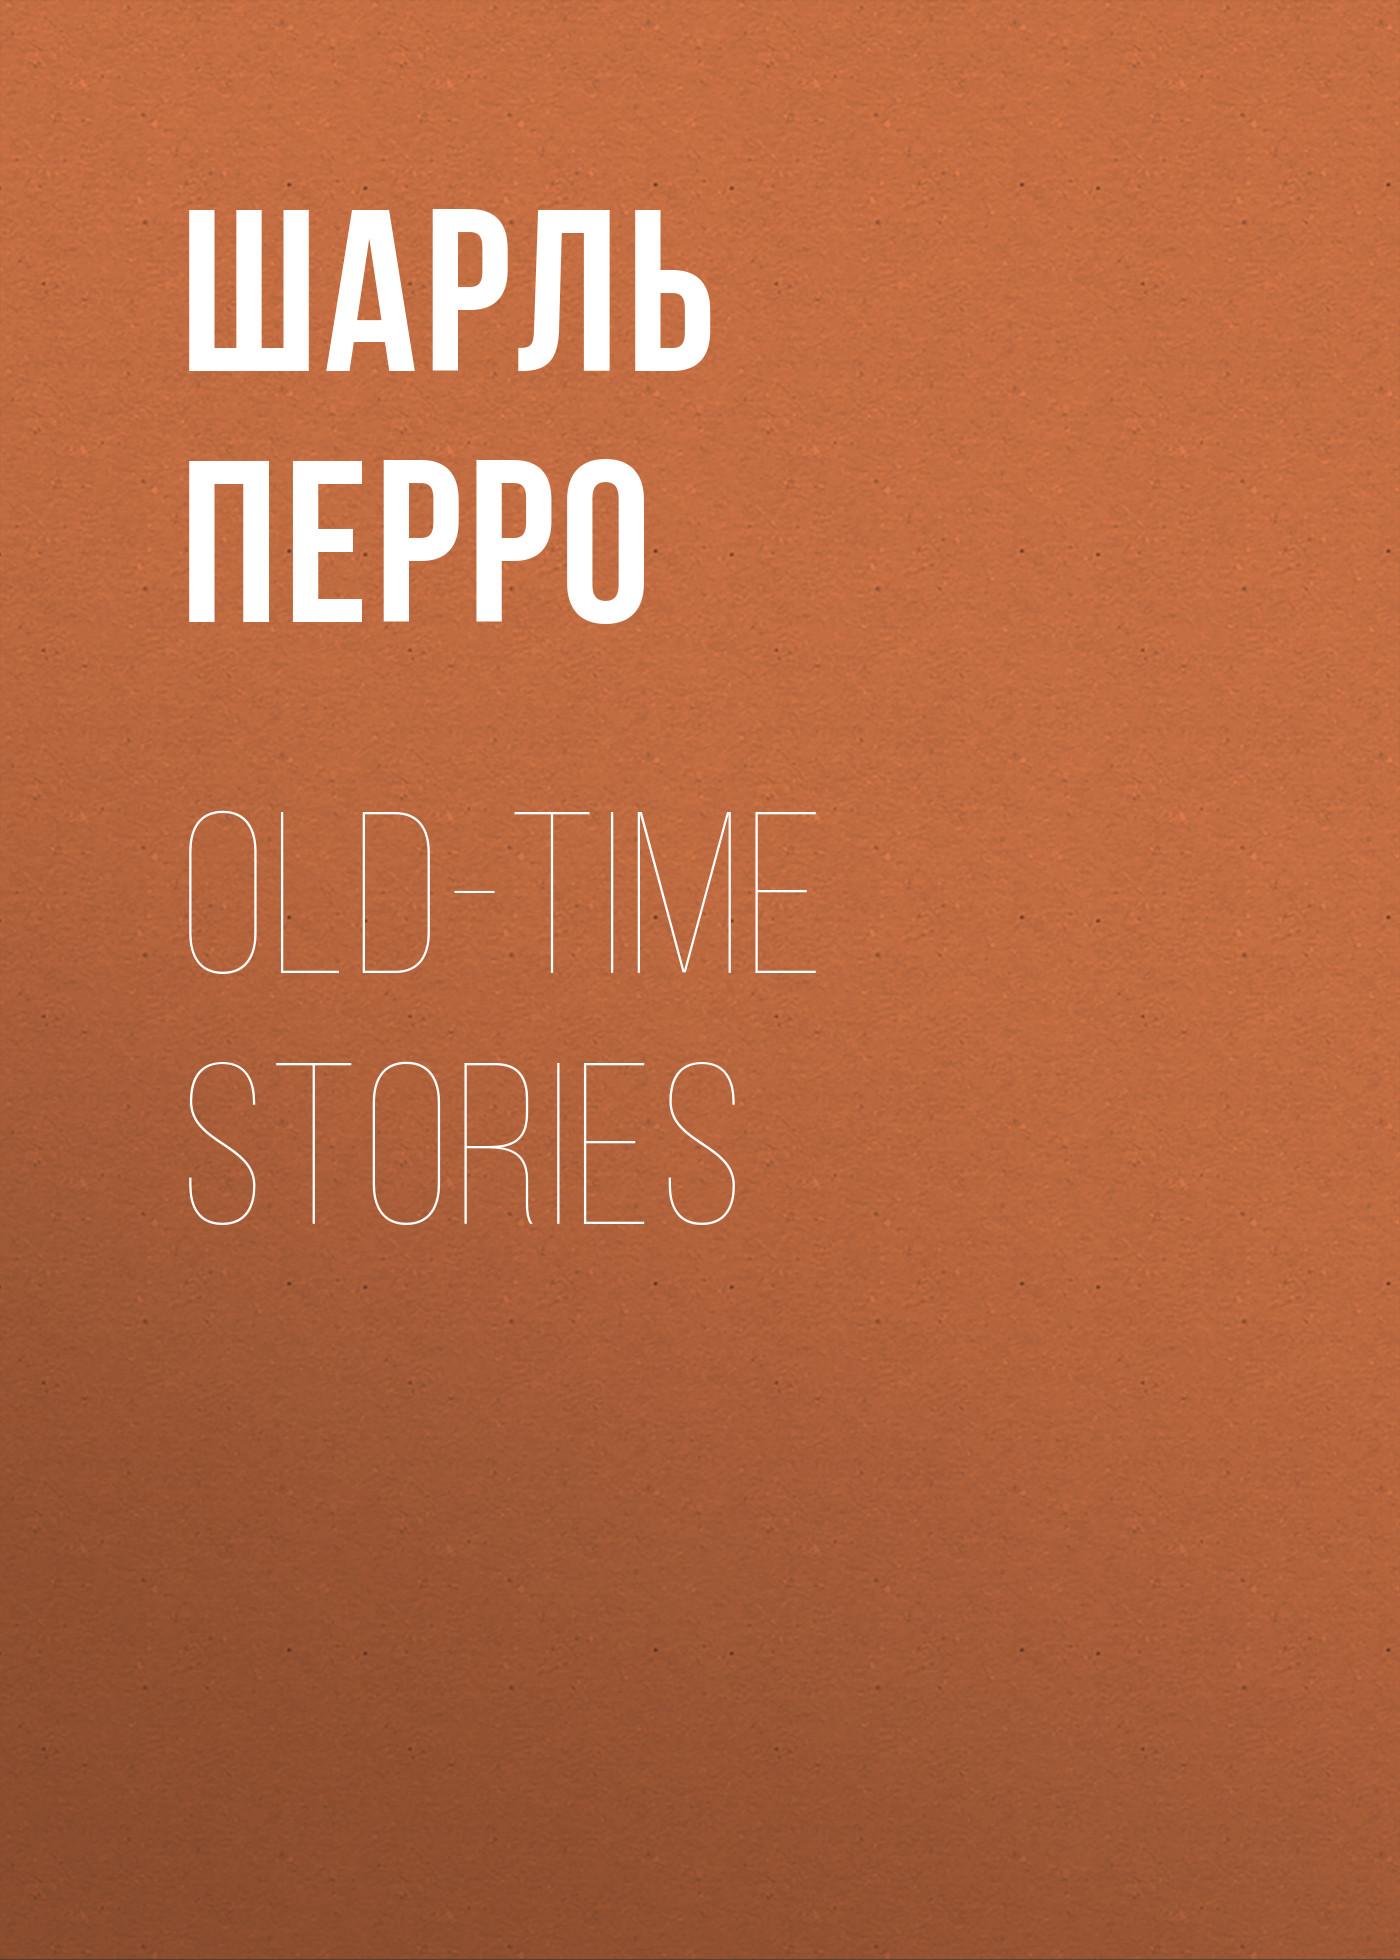 Шарль Перро Old-Time Stories vitaly mushkin erotic stories top ten